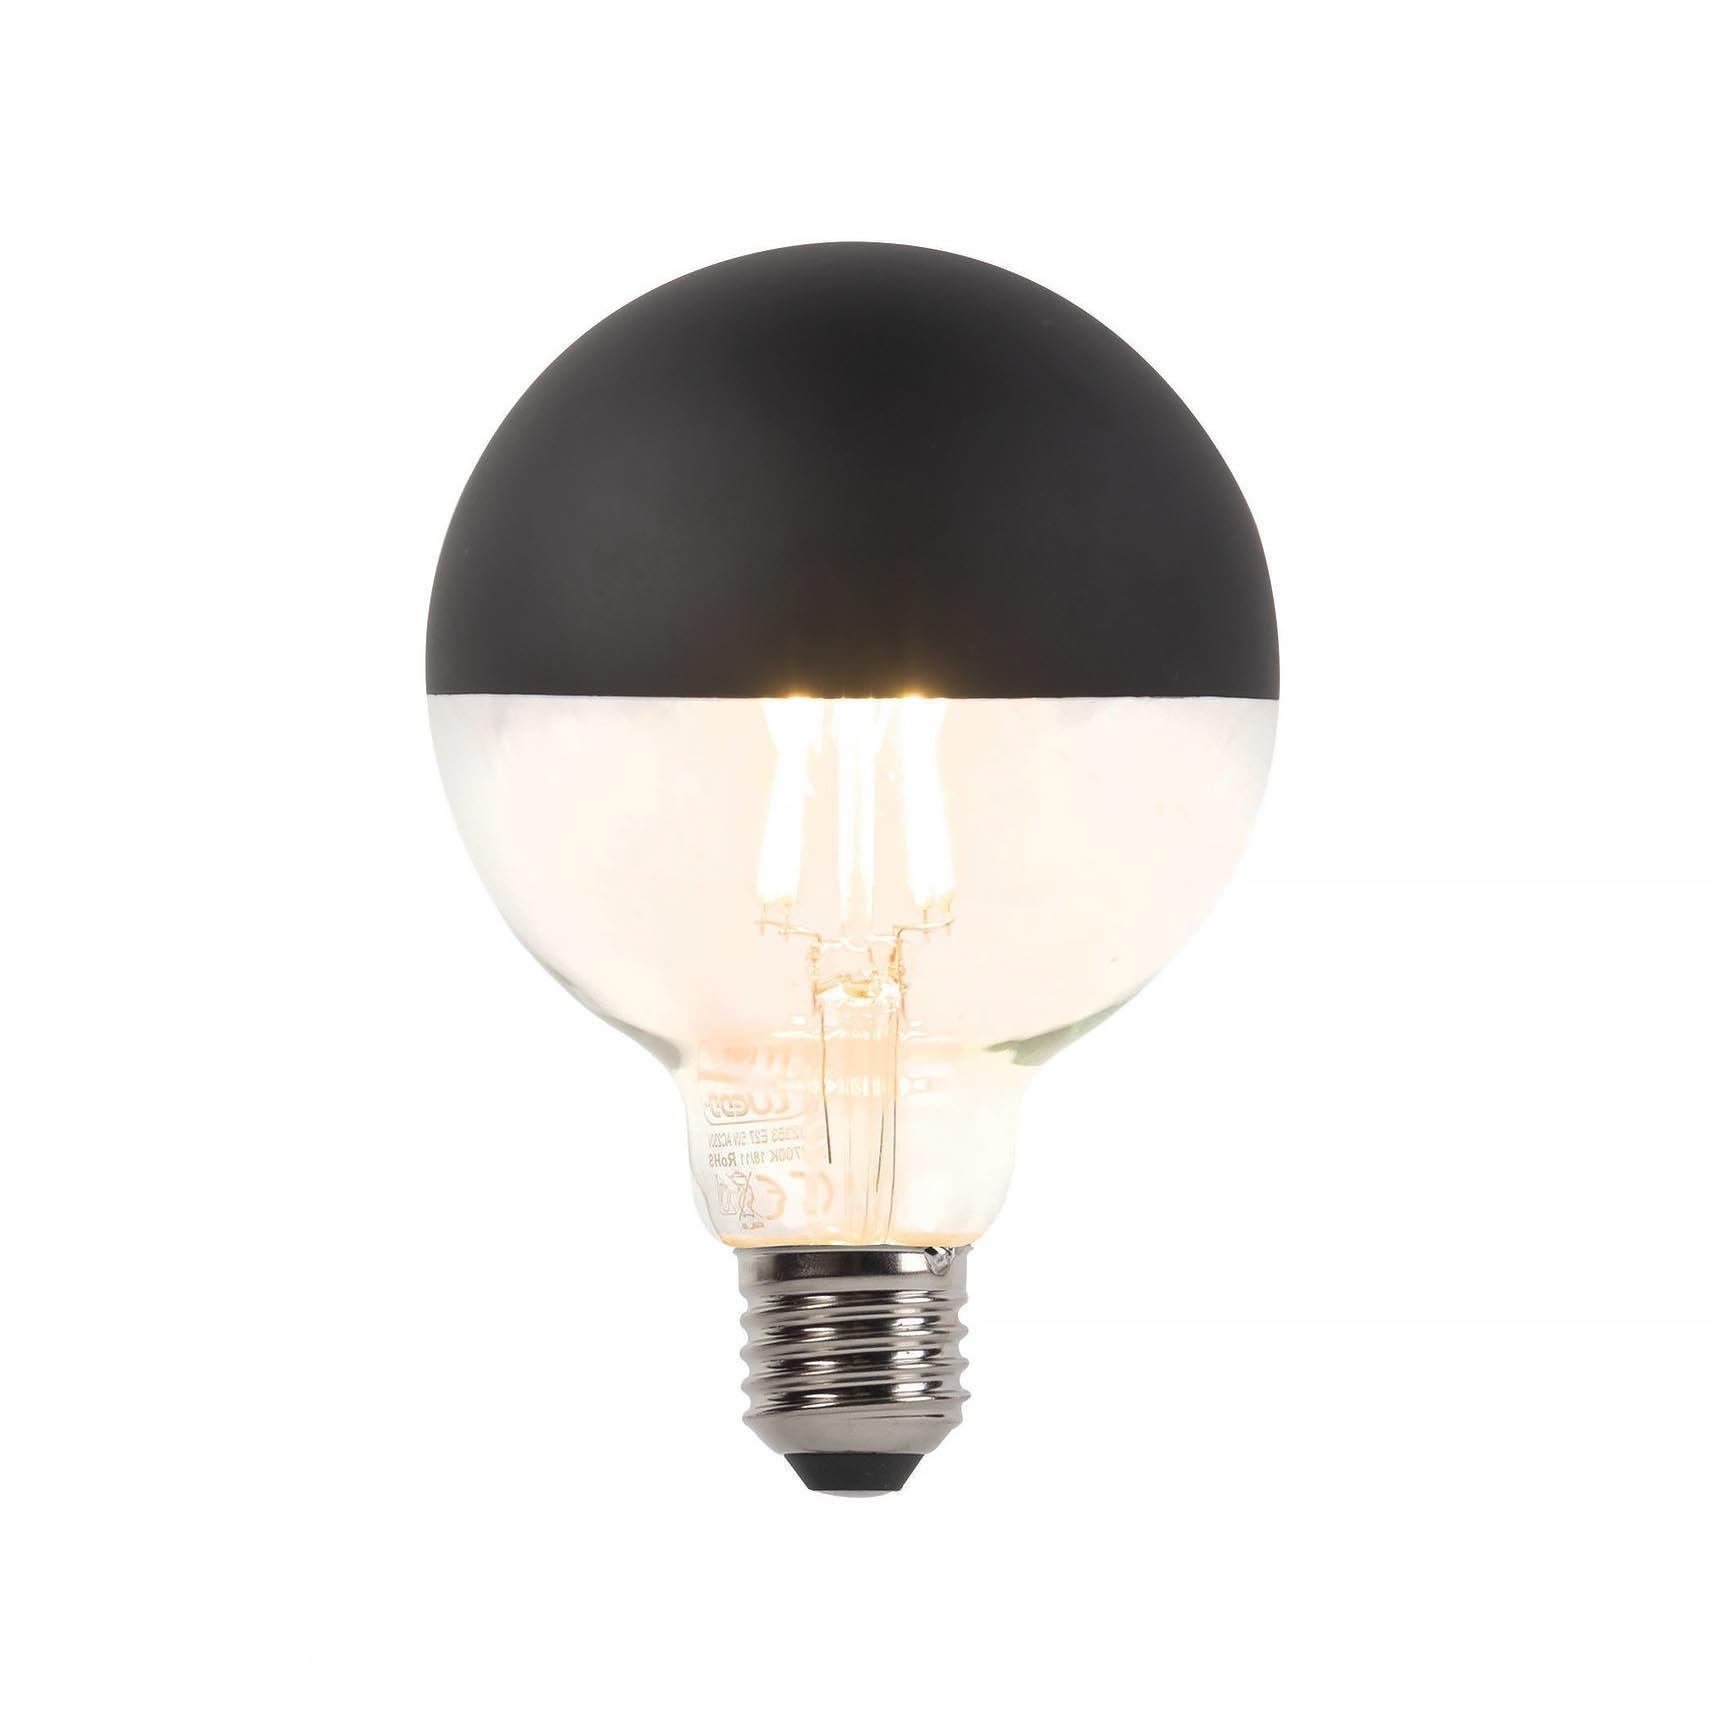 Qazqa Lamp Kopspiegel zwart LED 5W Filament Dimbaar 2700K 400LM